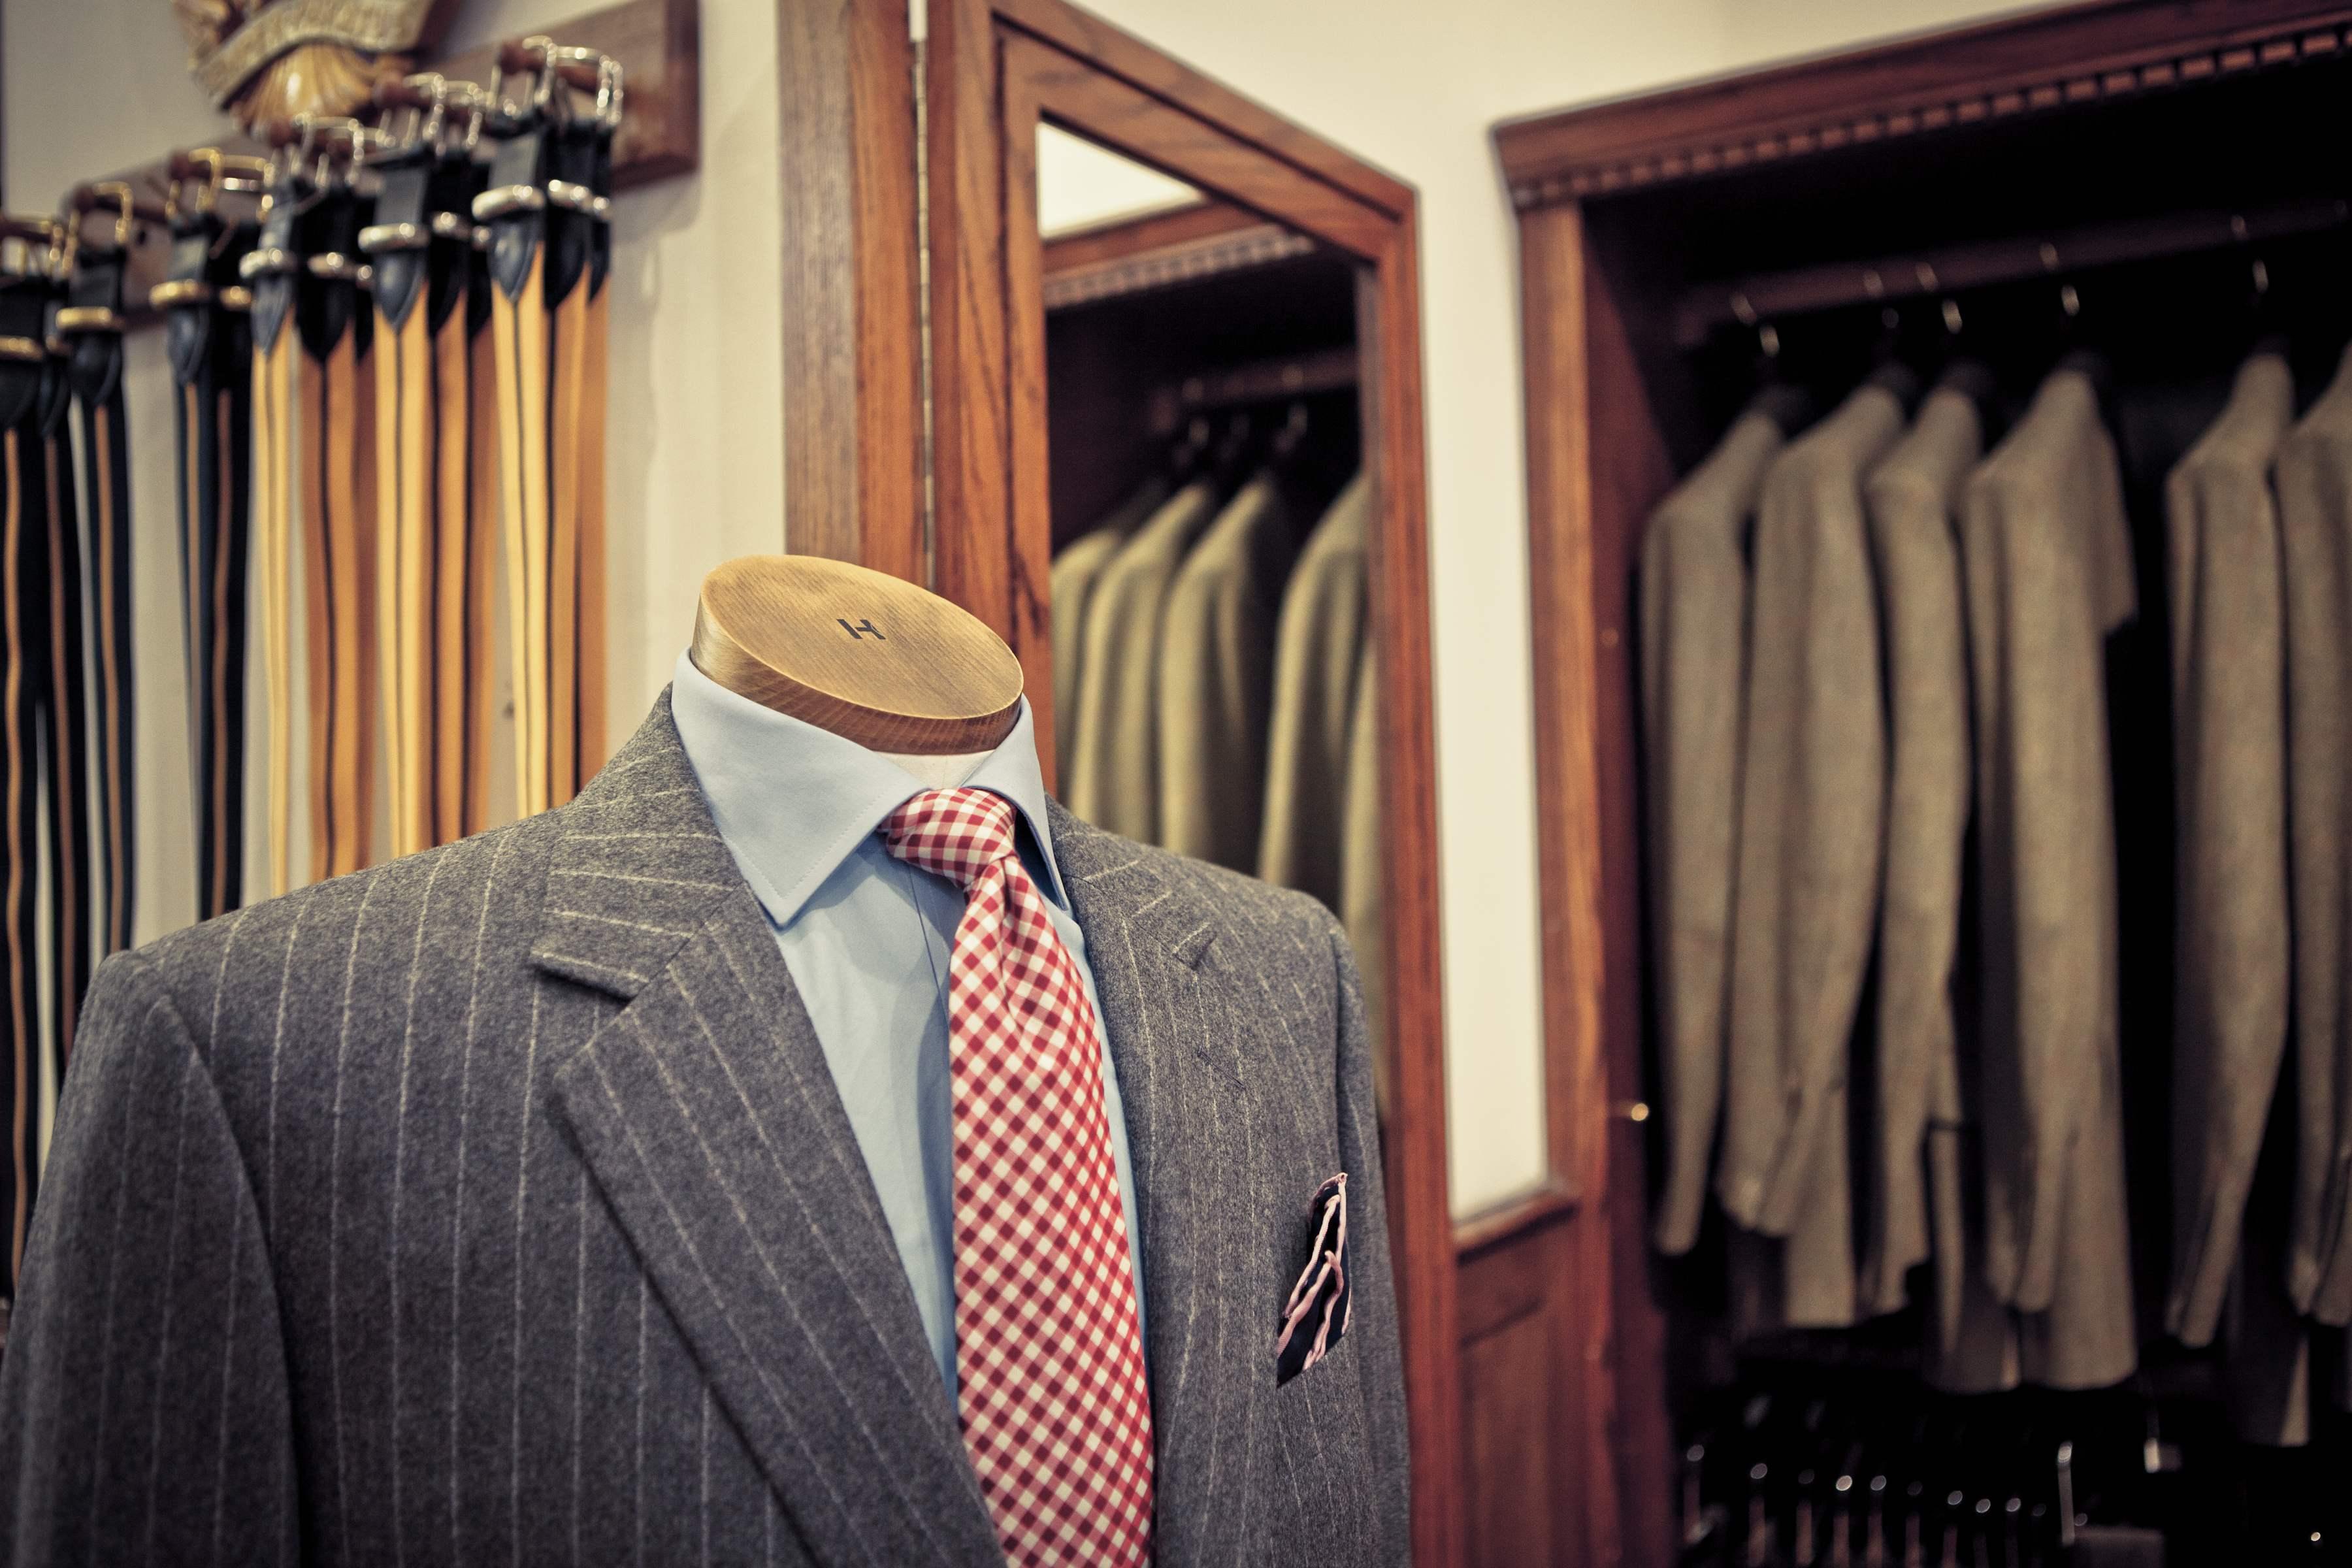 Masculine luxury booming despite the world economic crisis, deciphering a surprising paradox